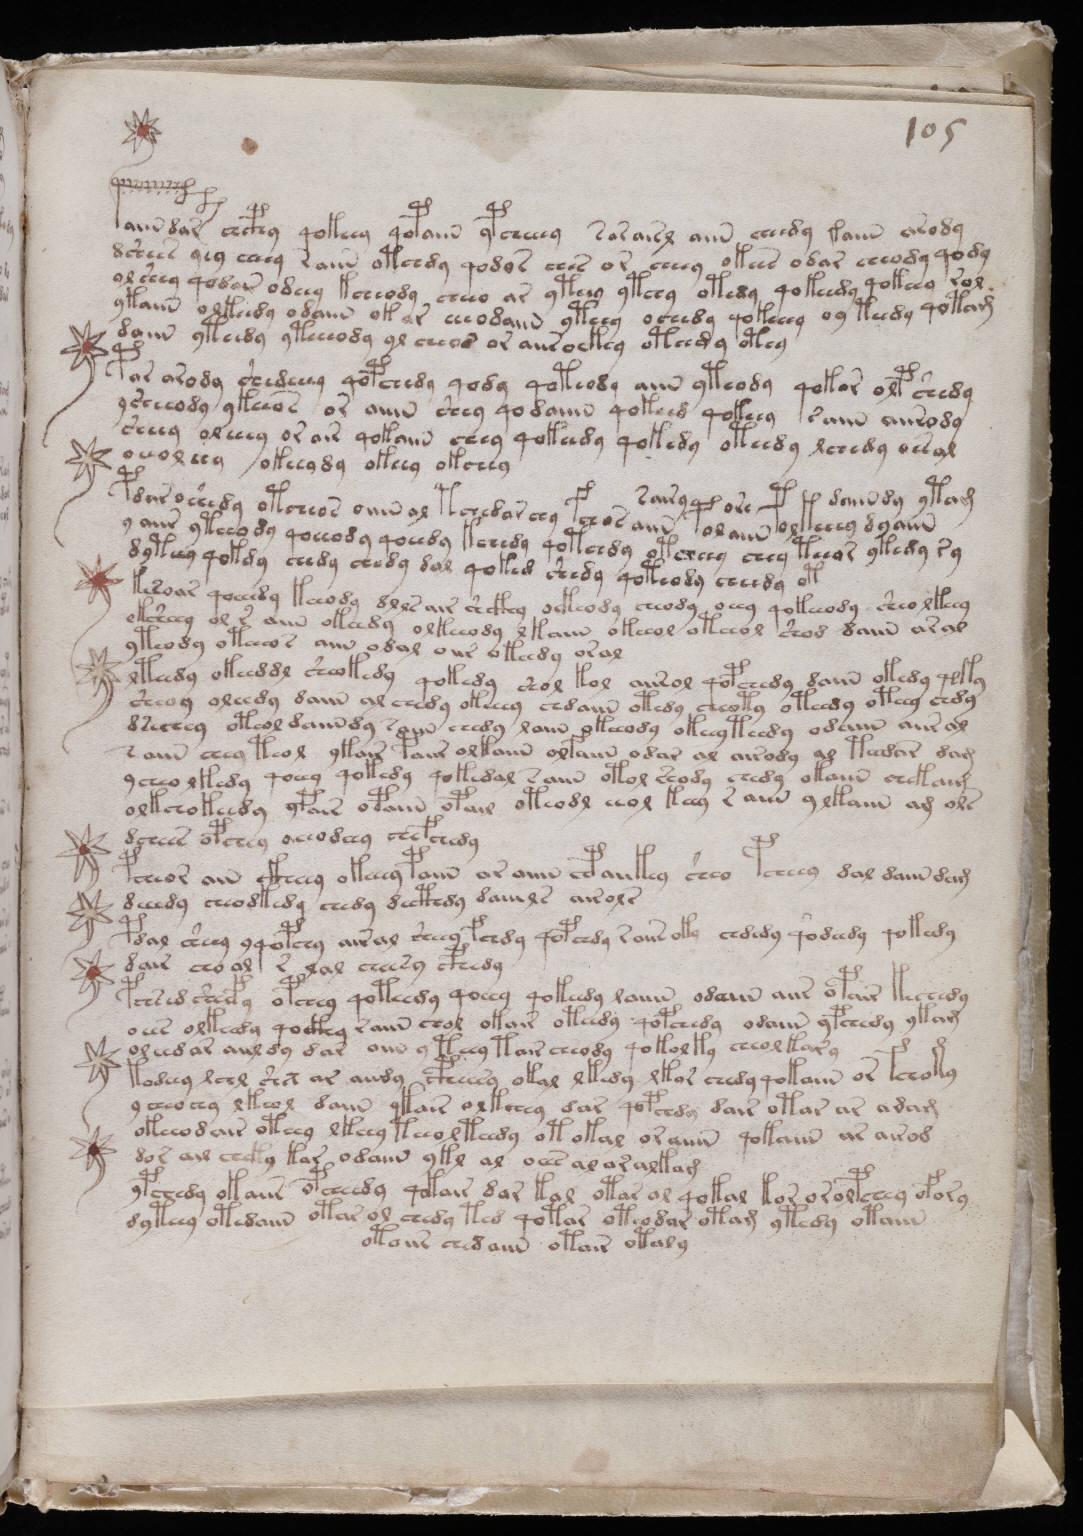 Voynich Manuscript %28187%29 ヴォイニッチ手稿(写本) どの言語にも属さない謎の文字!